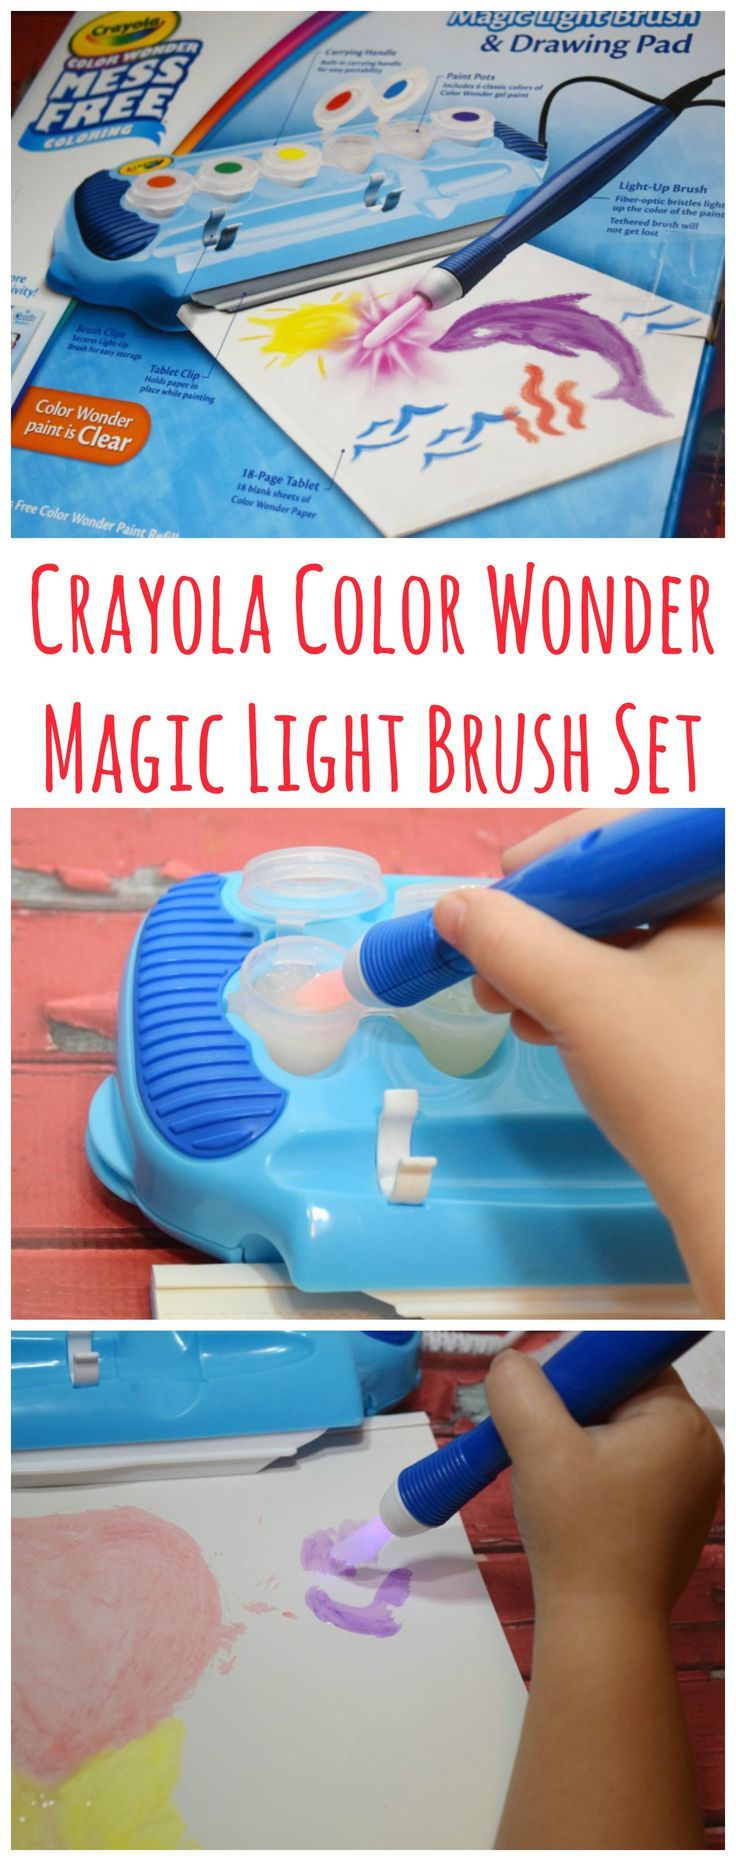 crayola color wonder magic light brush instructions